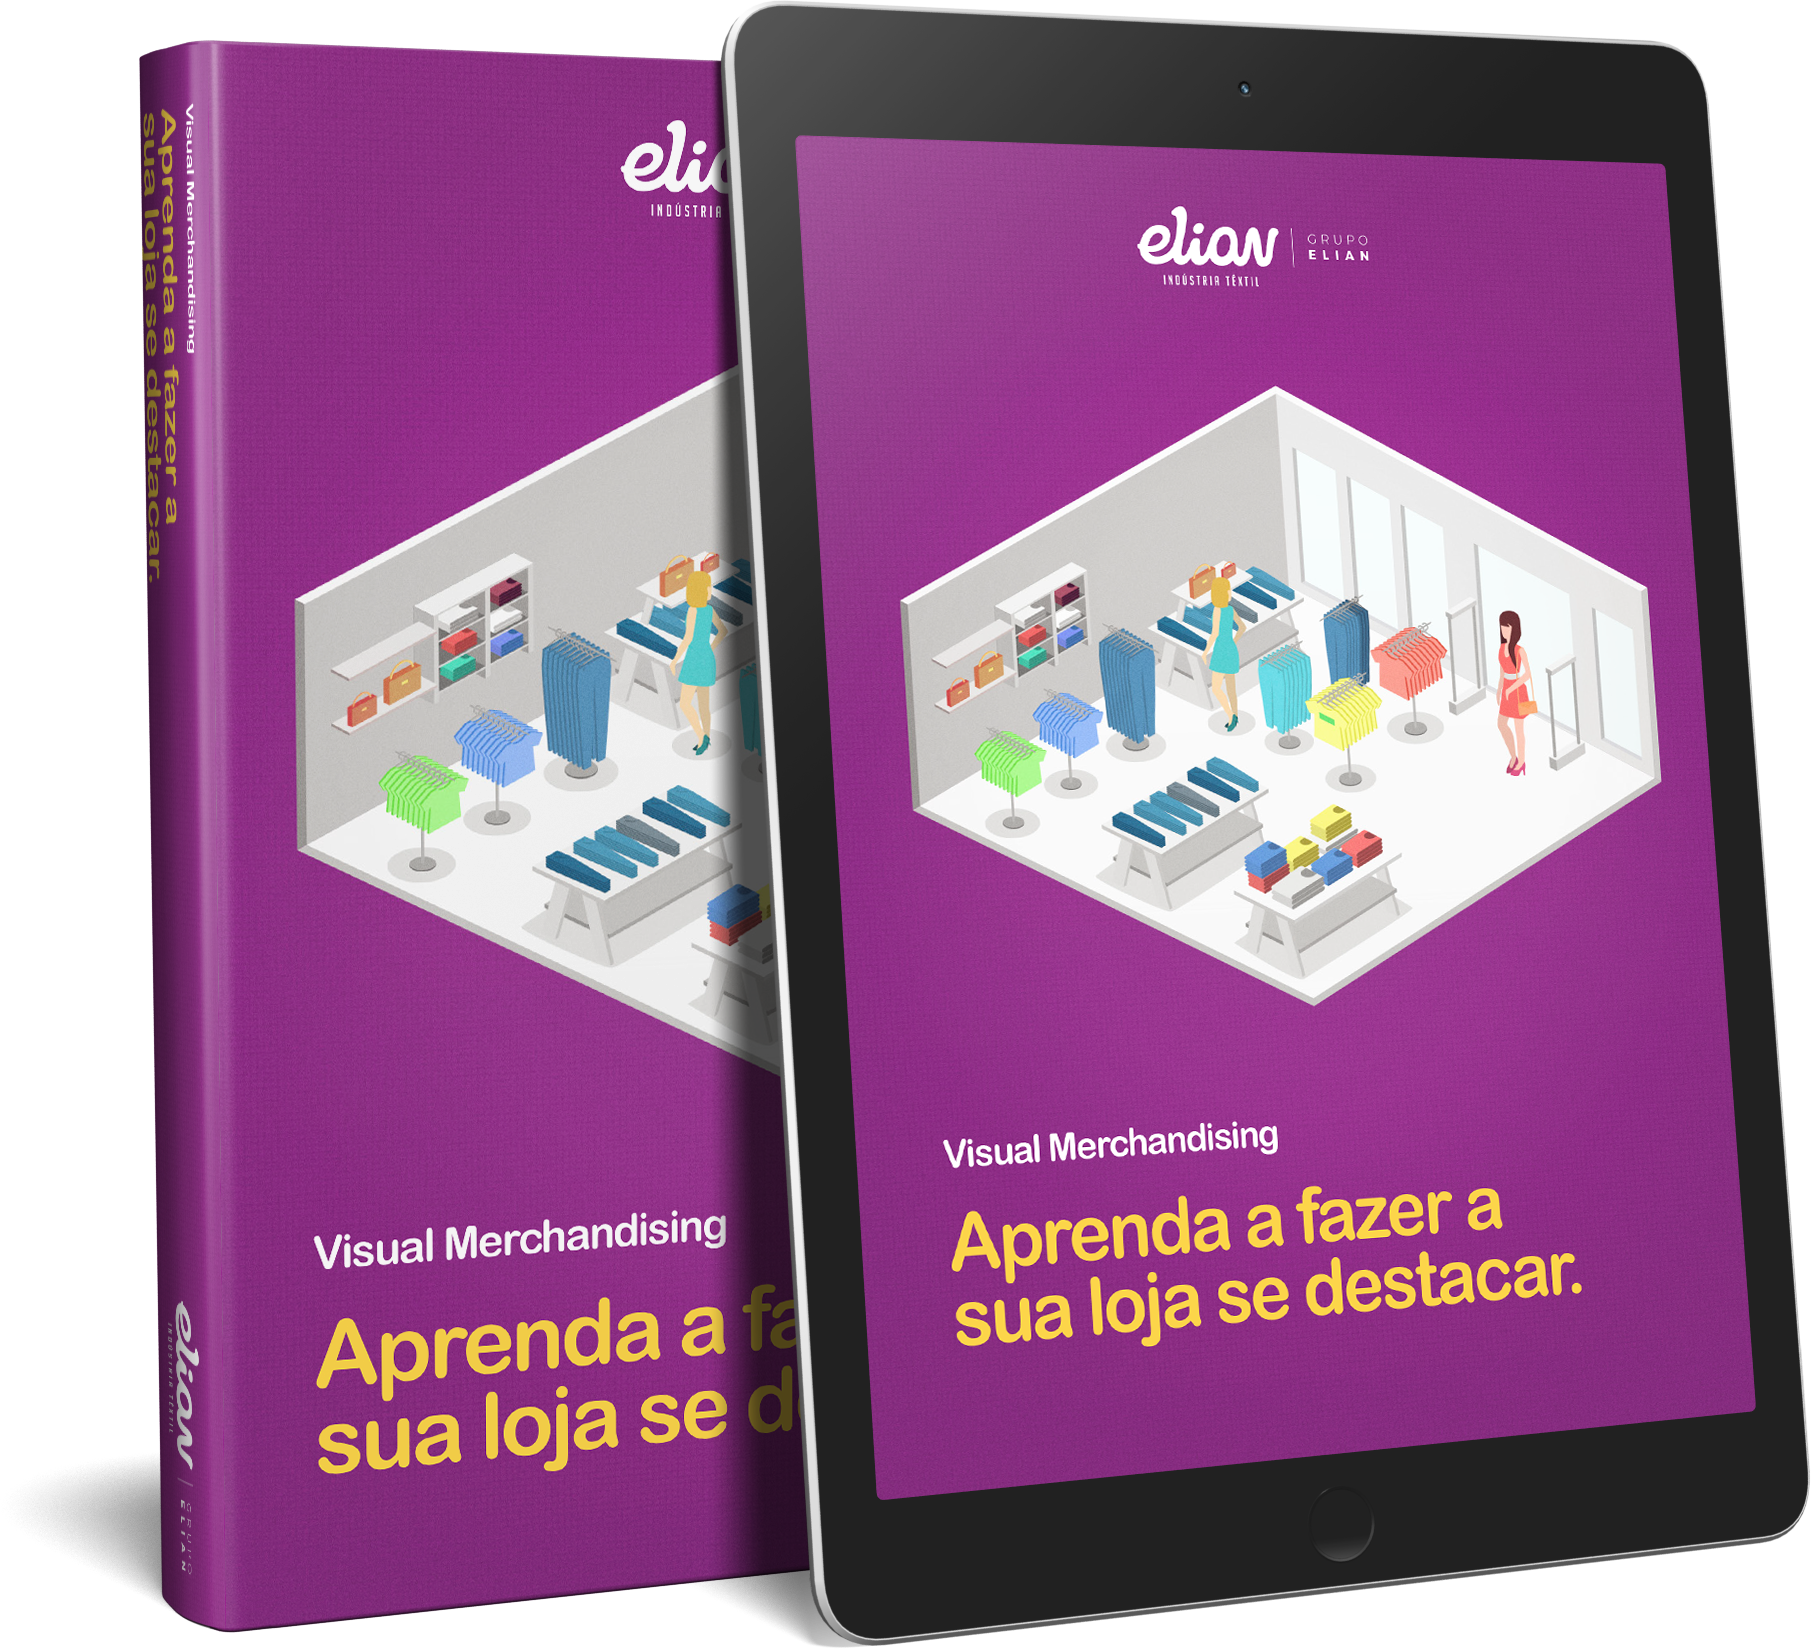 E-book Elian Visual Merchandising